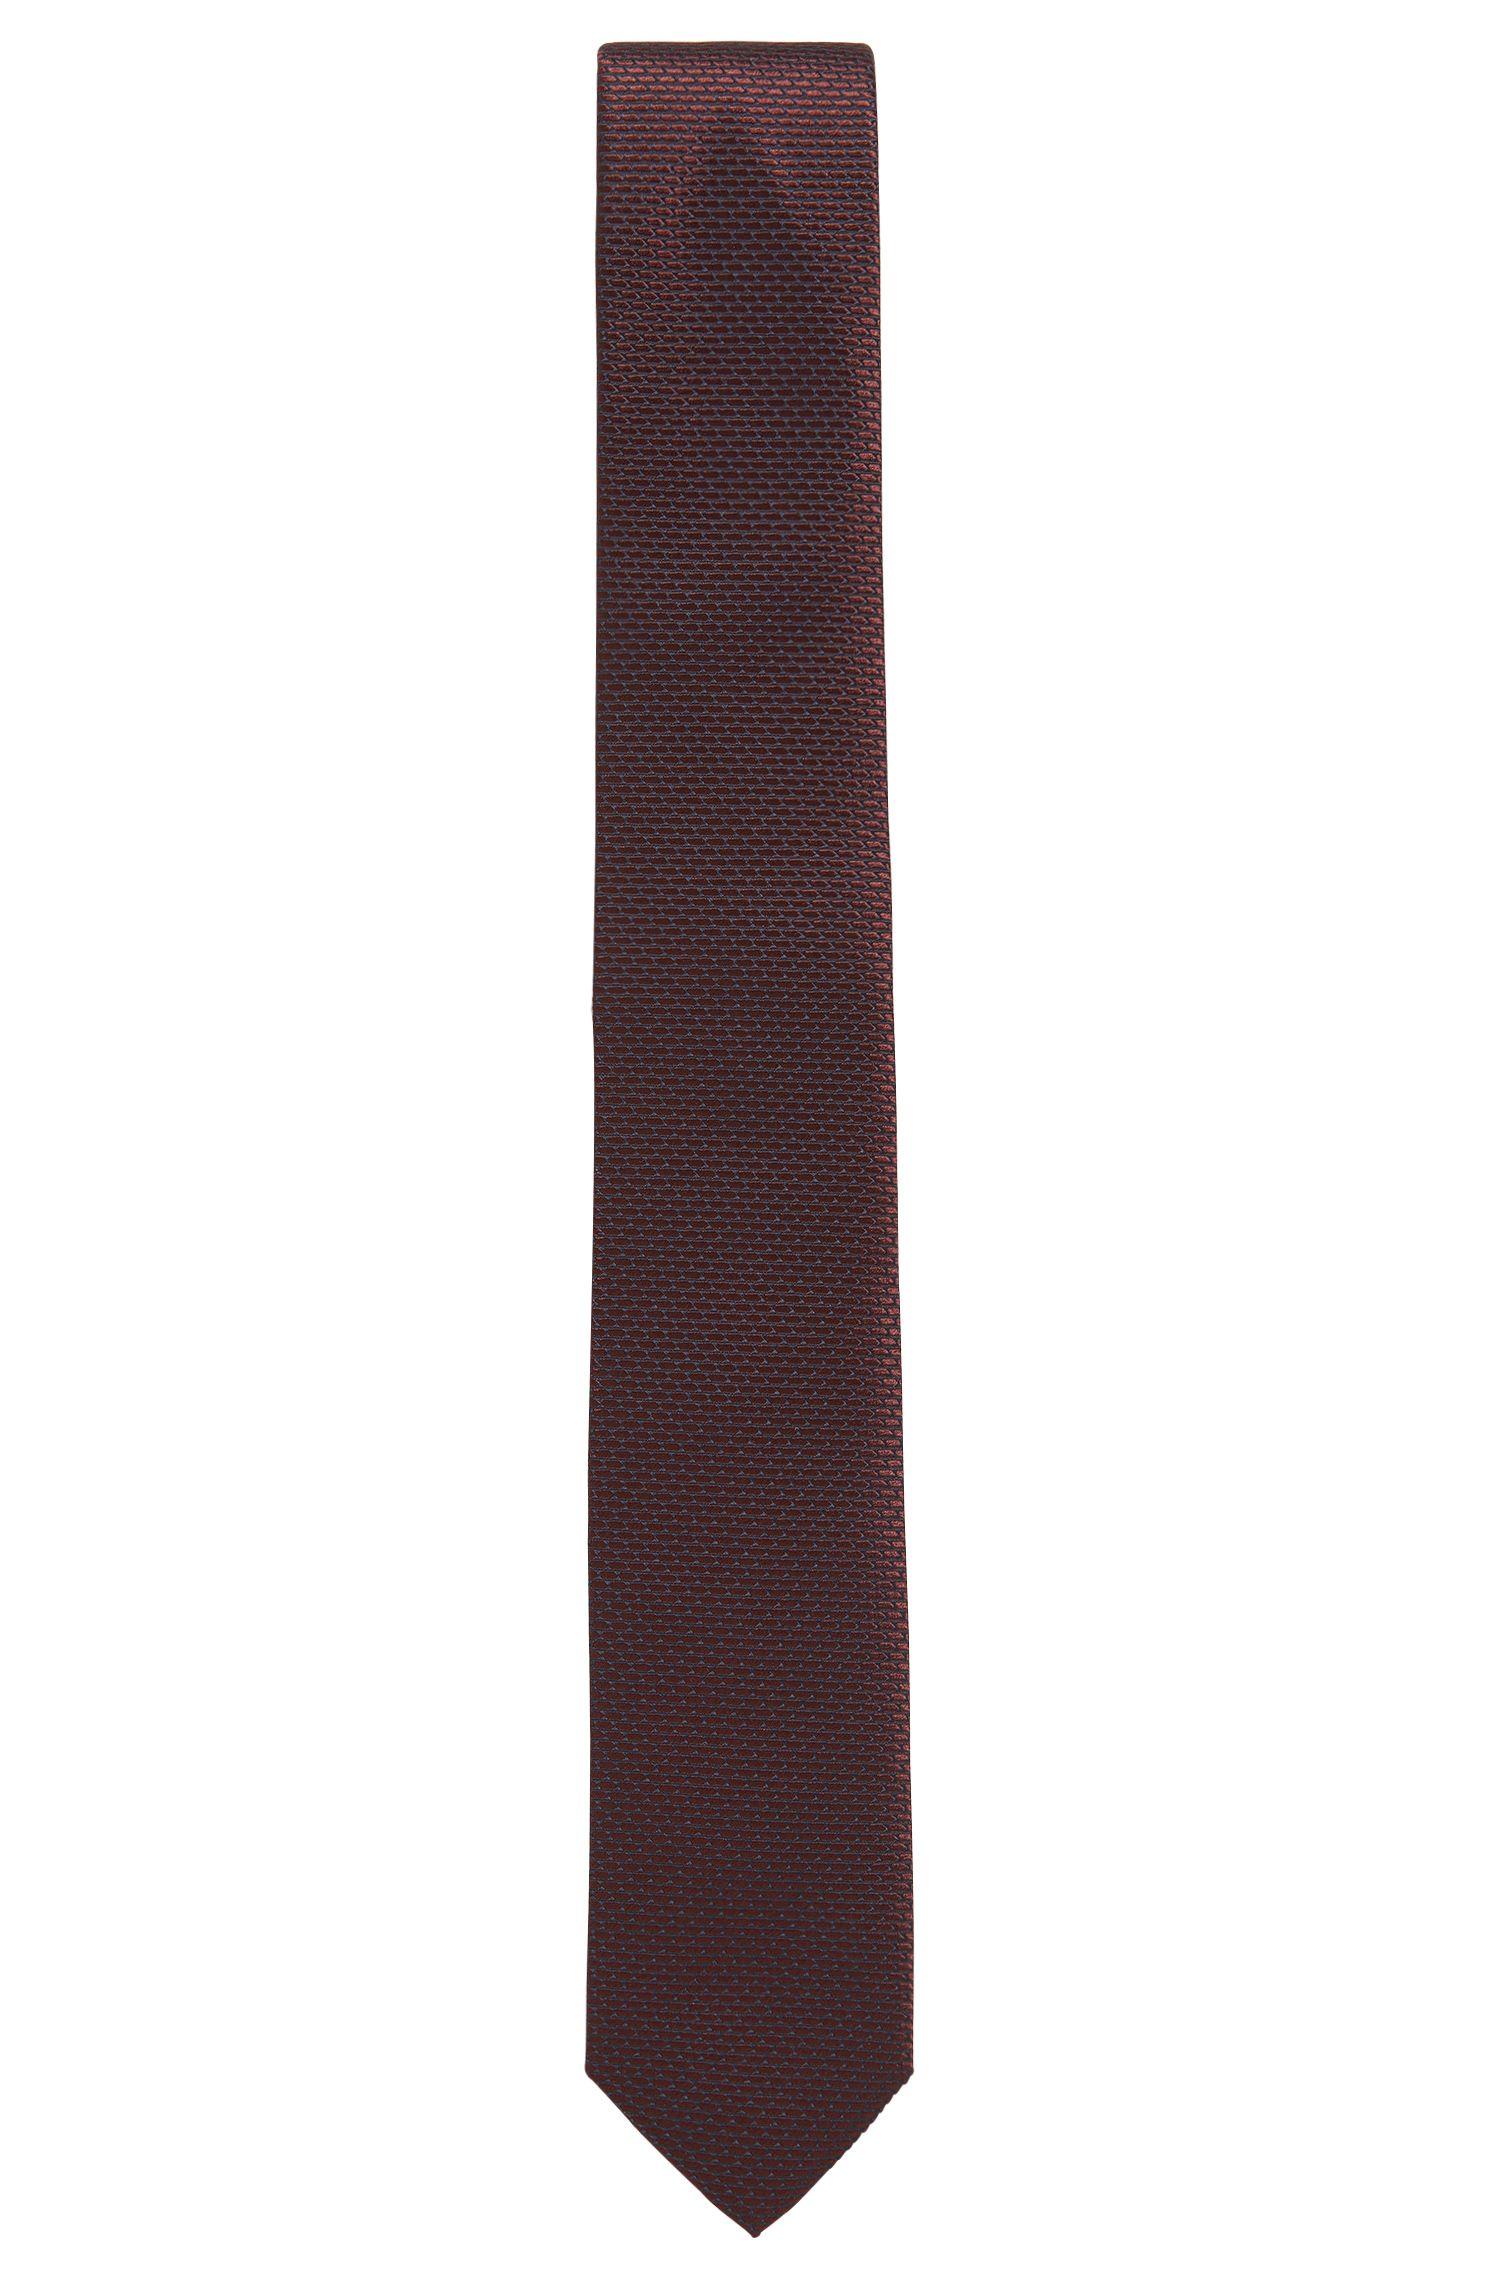 BOSS Tailored Textured Italian Silk Slim Tie